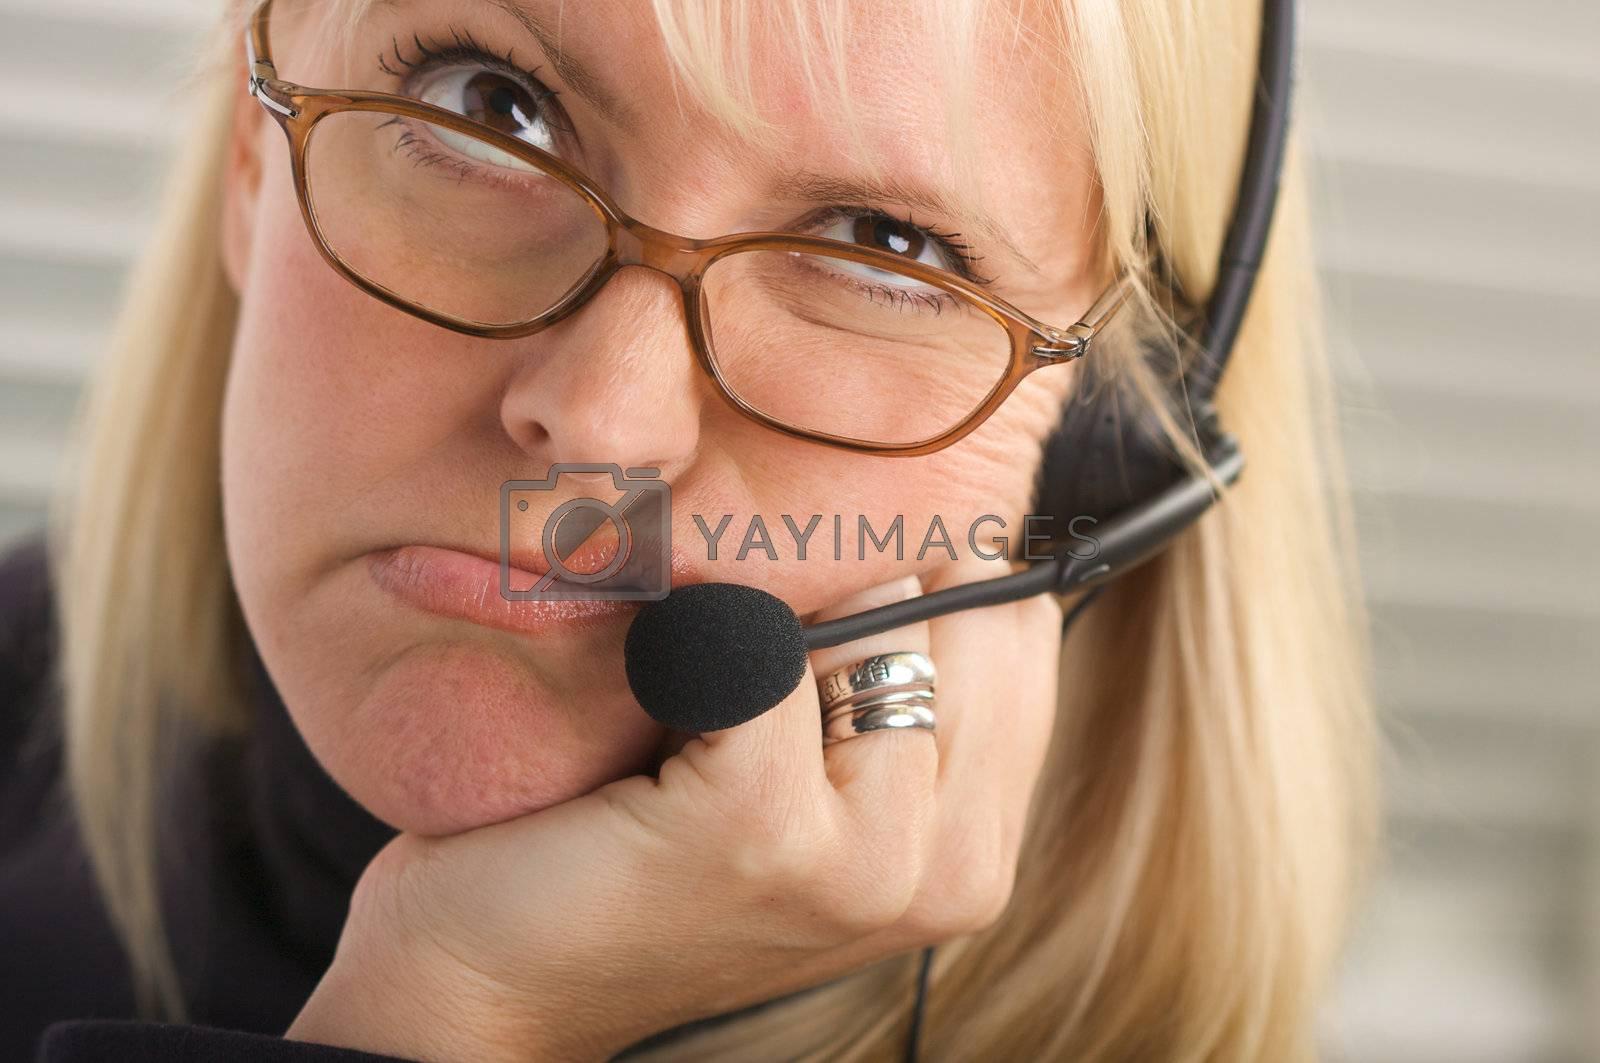 Attractive businesswoman talks on her phone headset.